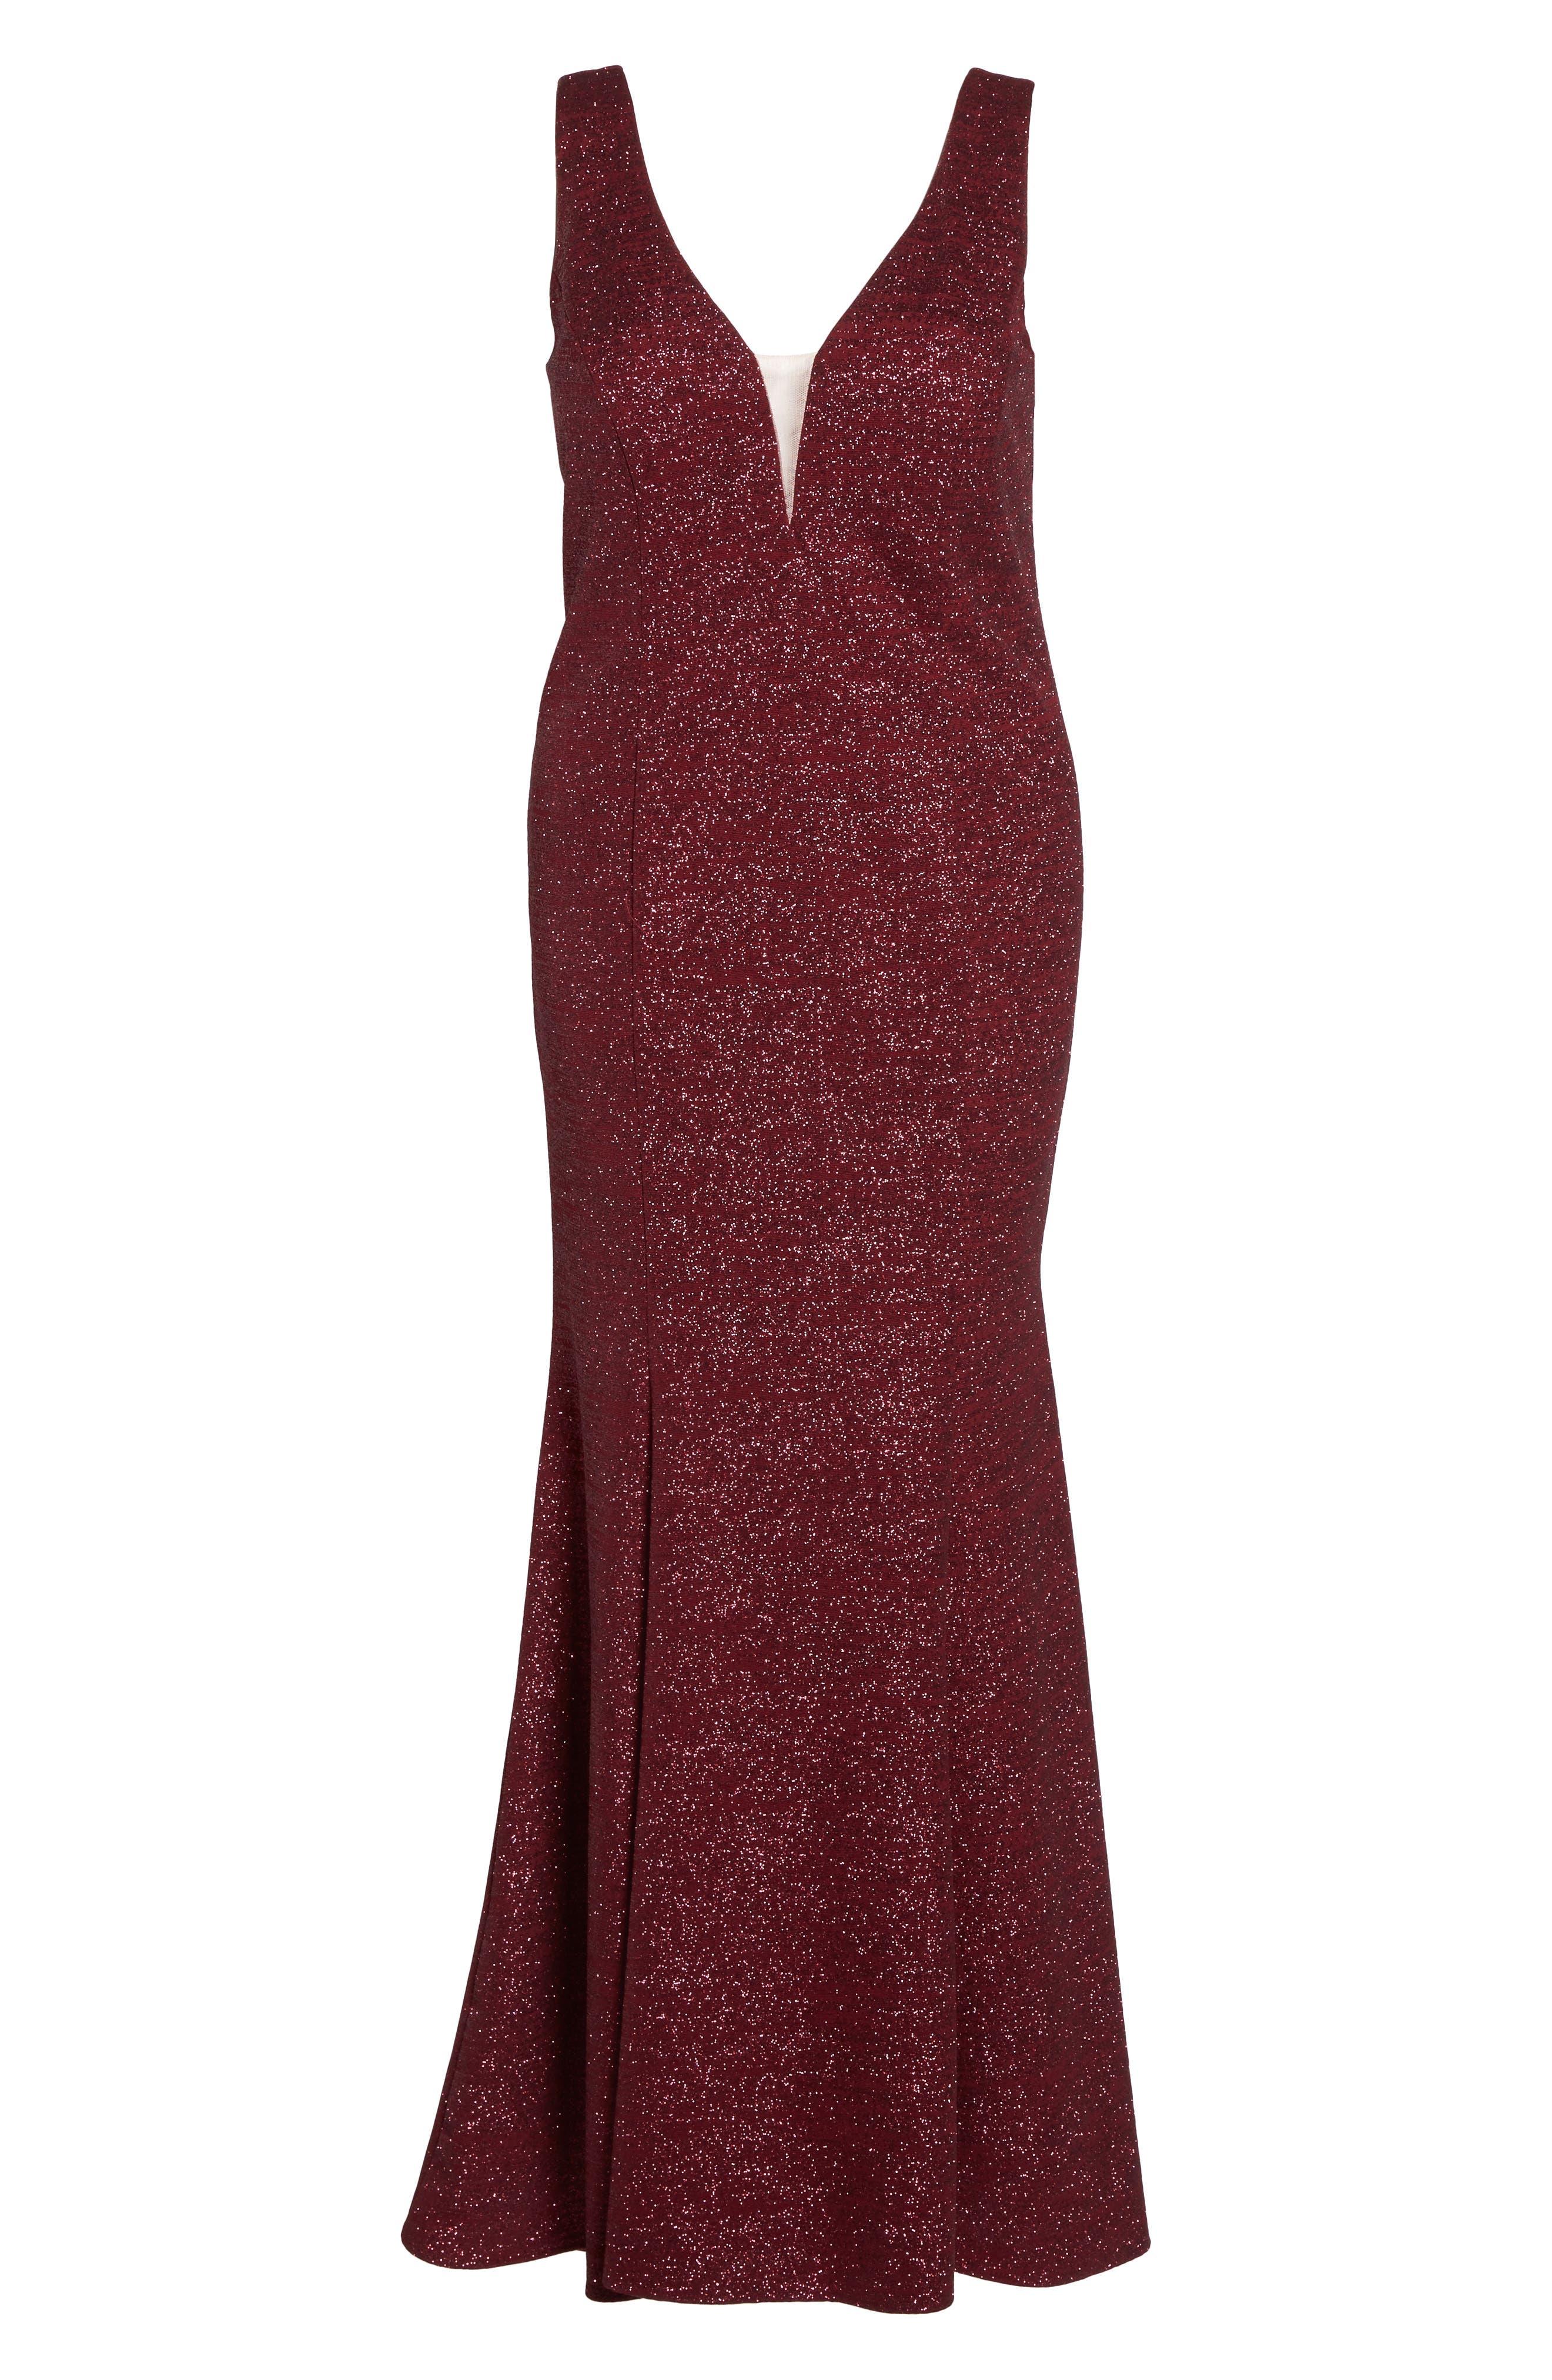 Metallic Knit Mermaid Gown,                             Alternate thumbnail 6, color,                             600